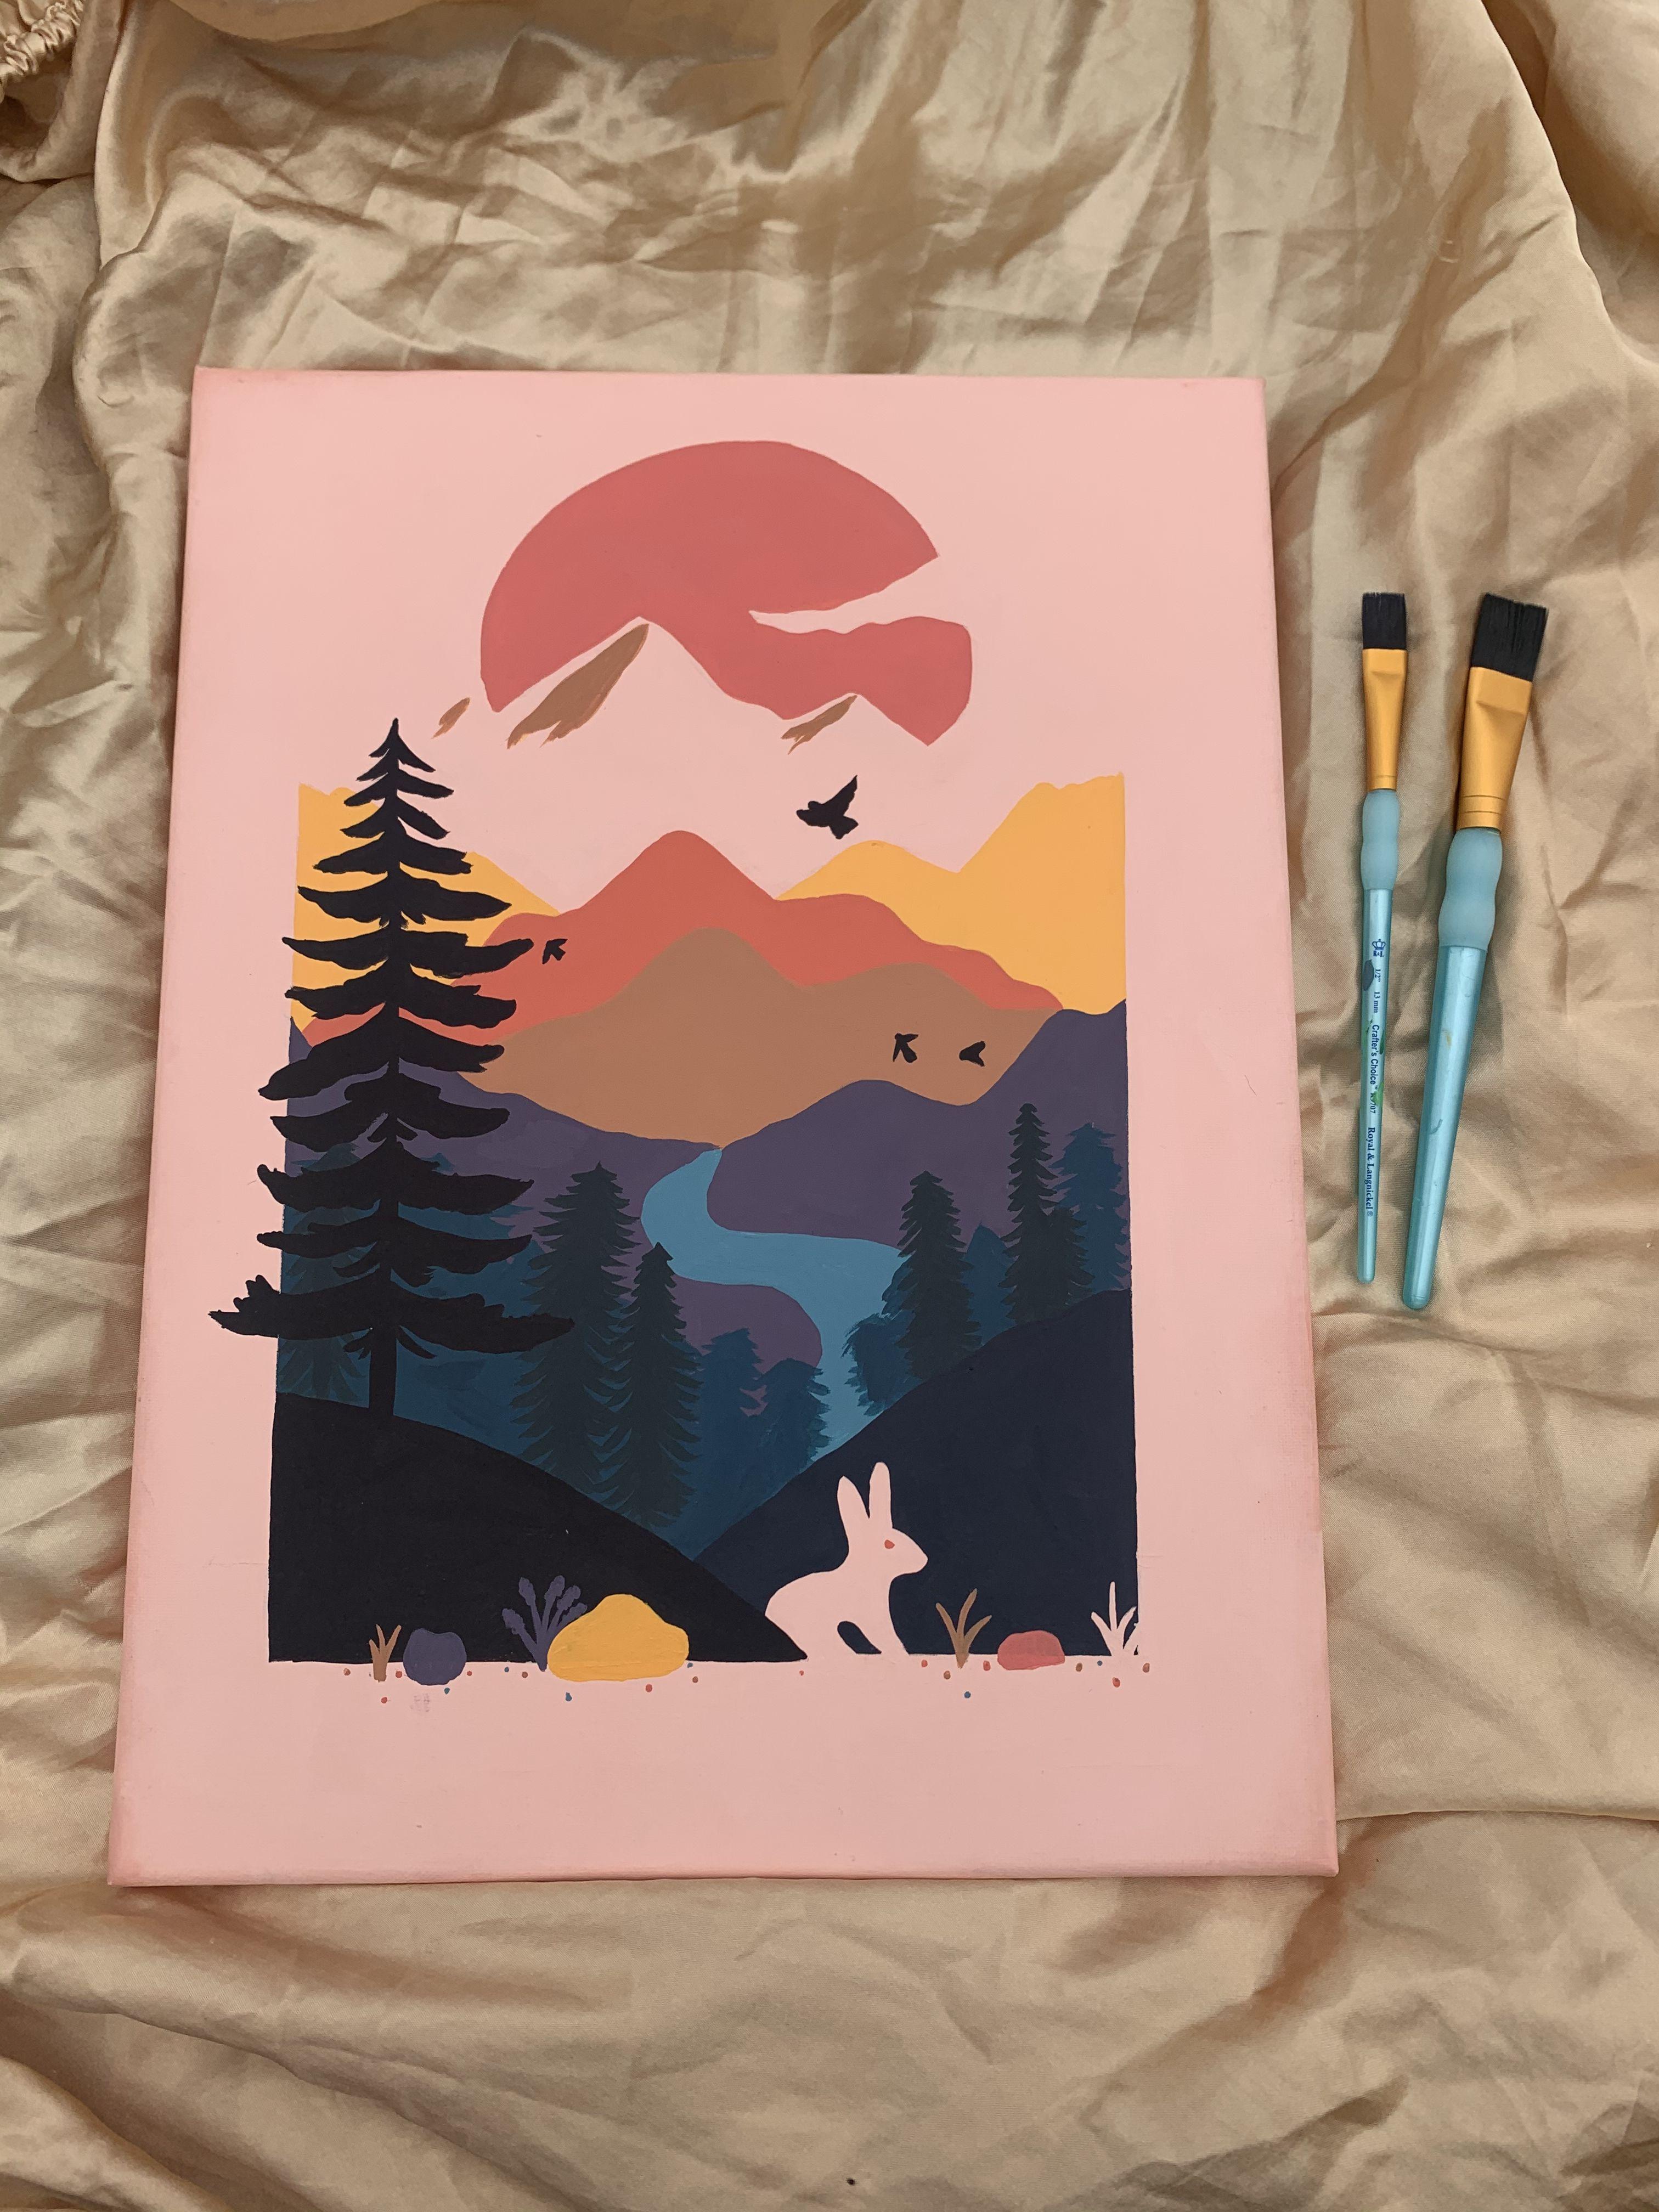 100 Acrylic painting ideas in 2021 | sky aesthetic